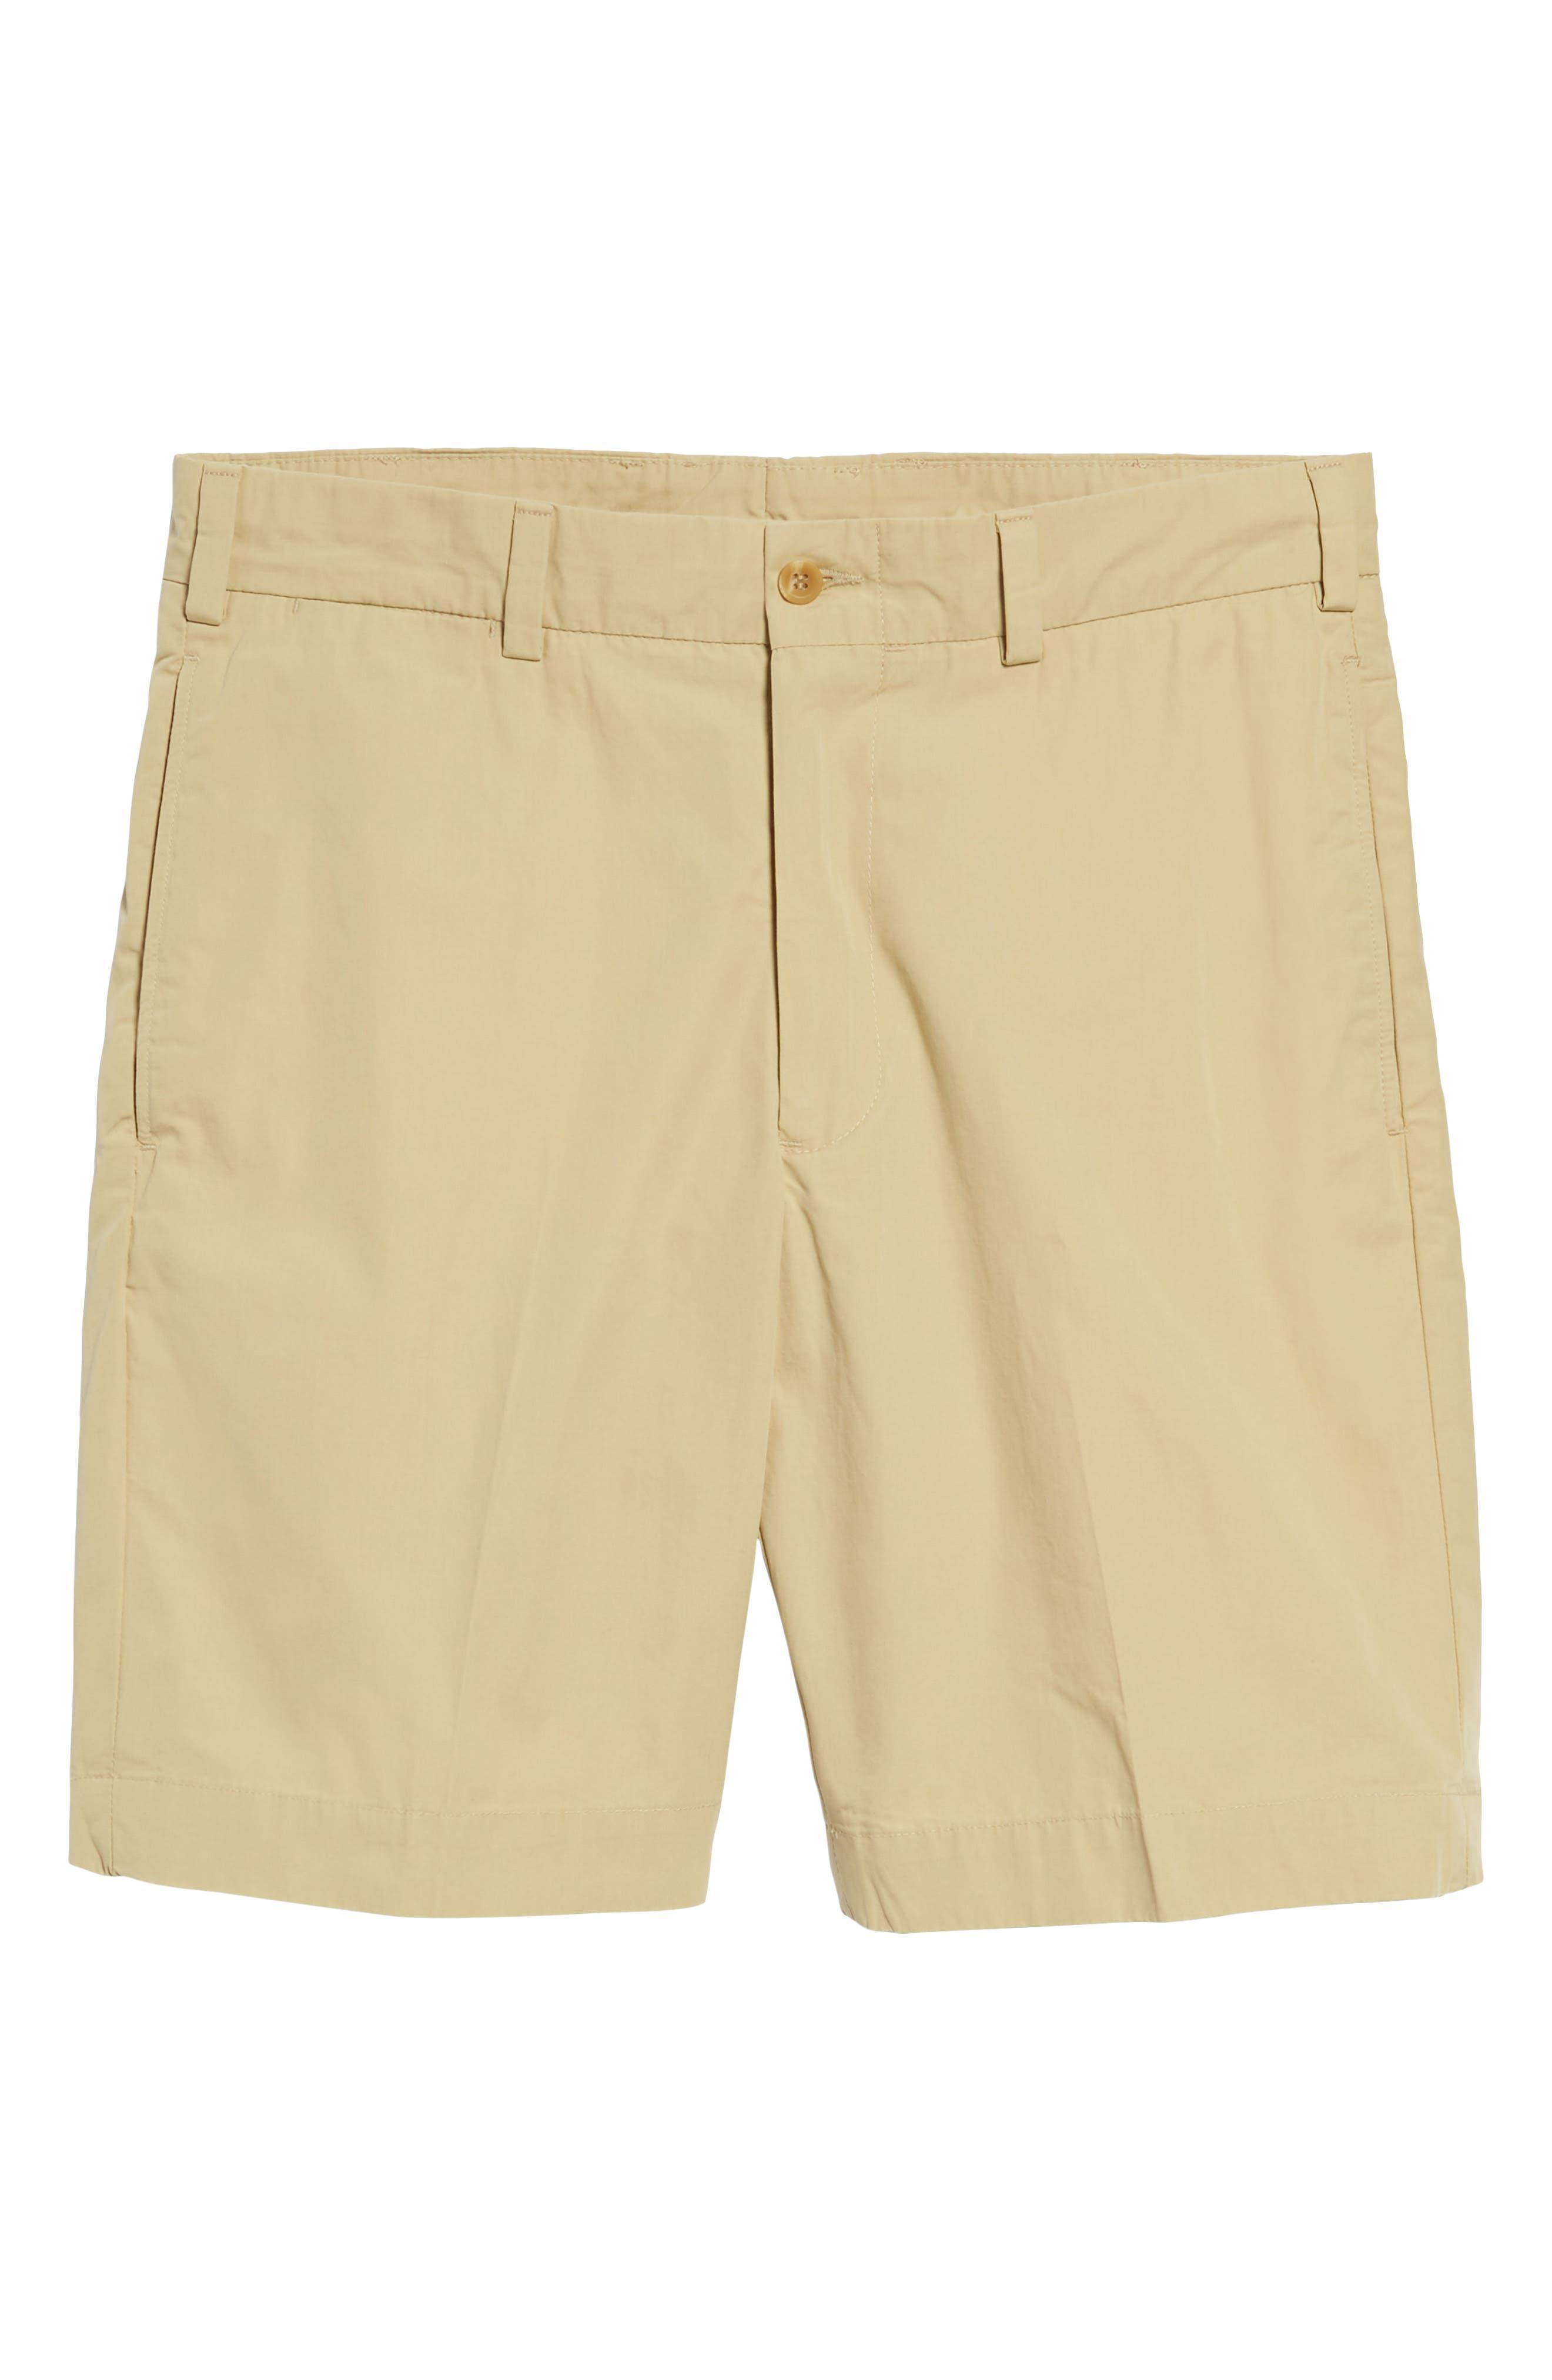 M2 Classic Fit Flat Front Tropical Cotton Poplin Shorts,                             Alternate thumbnail 6, color,                             KHAKI